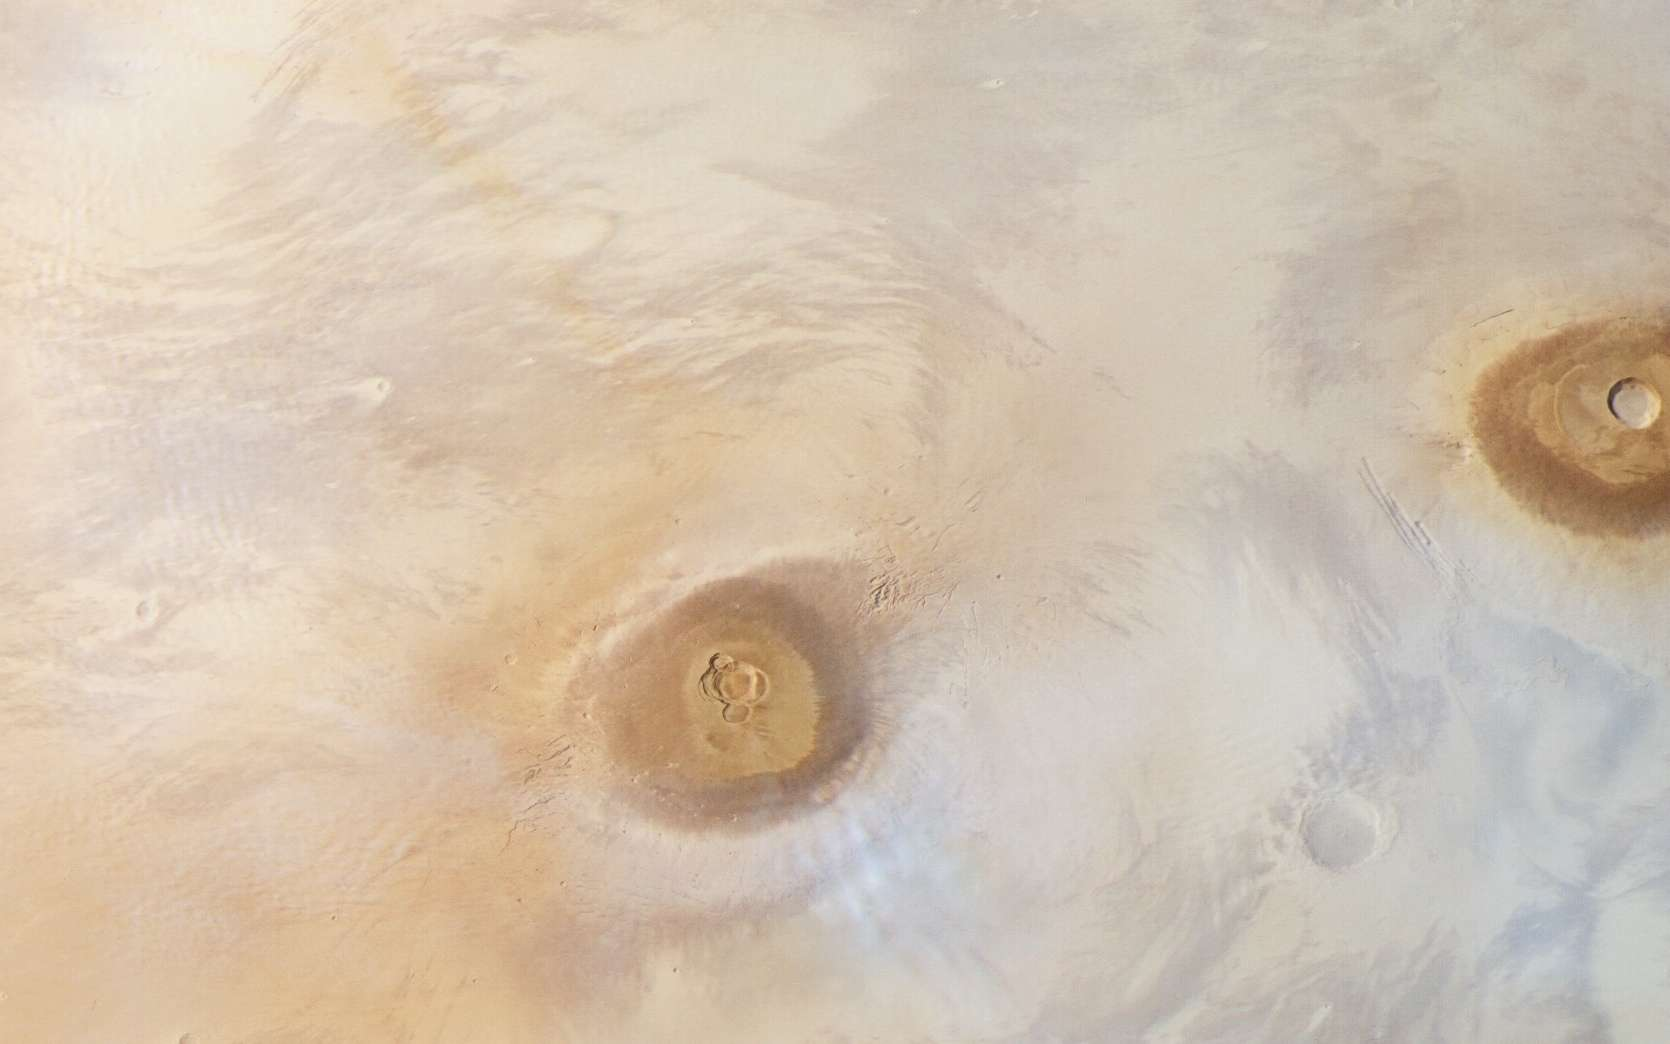 Extrait de la vue globale de Mars prise par Mars Express lors de sa 17.444e/sup> orbite de Mars. © ESA, DLR, FU Berlin, CC by-sa 3.0 IGO